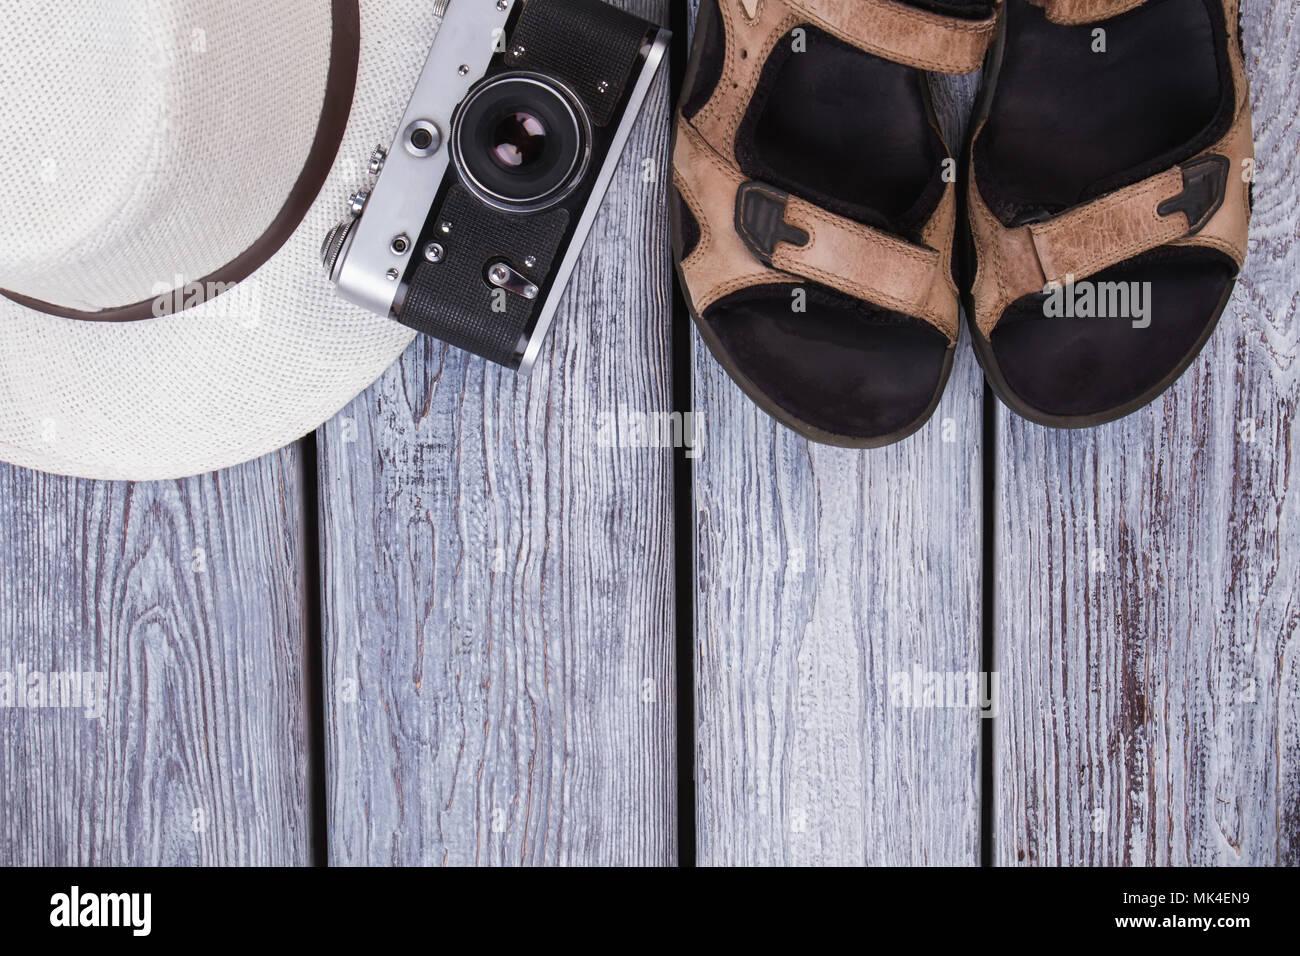 Scrivania Vintage Bianca : Estate traveler attributi con copyspace. sandali maschio vintage